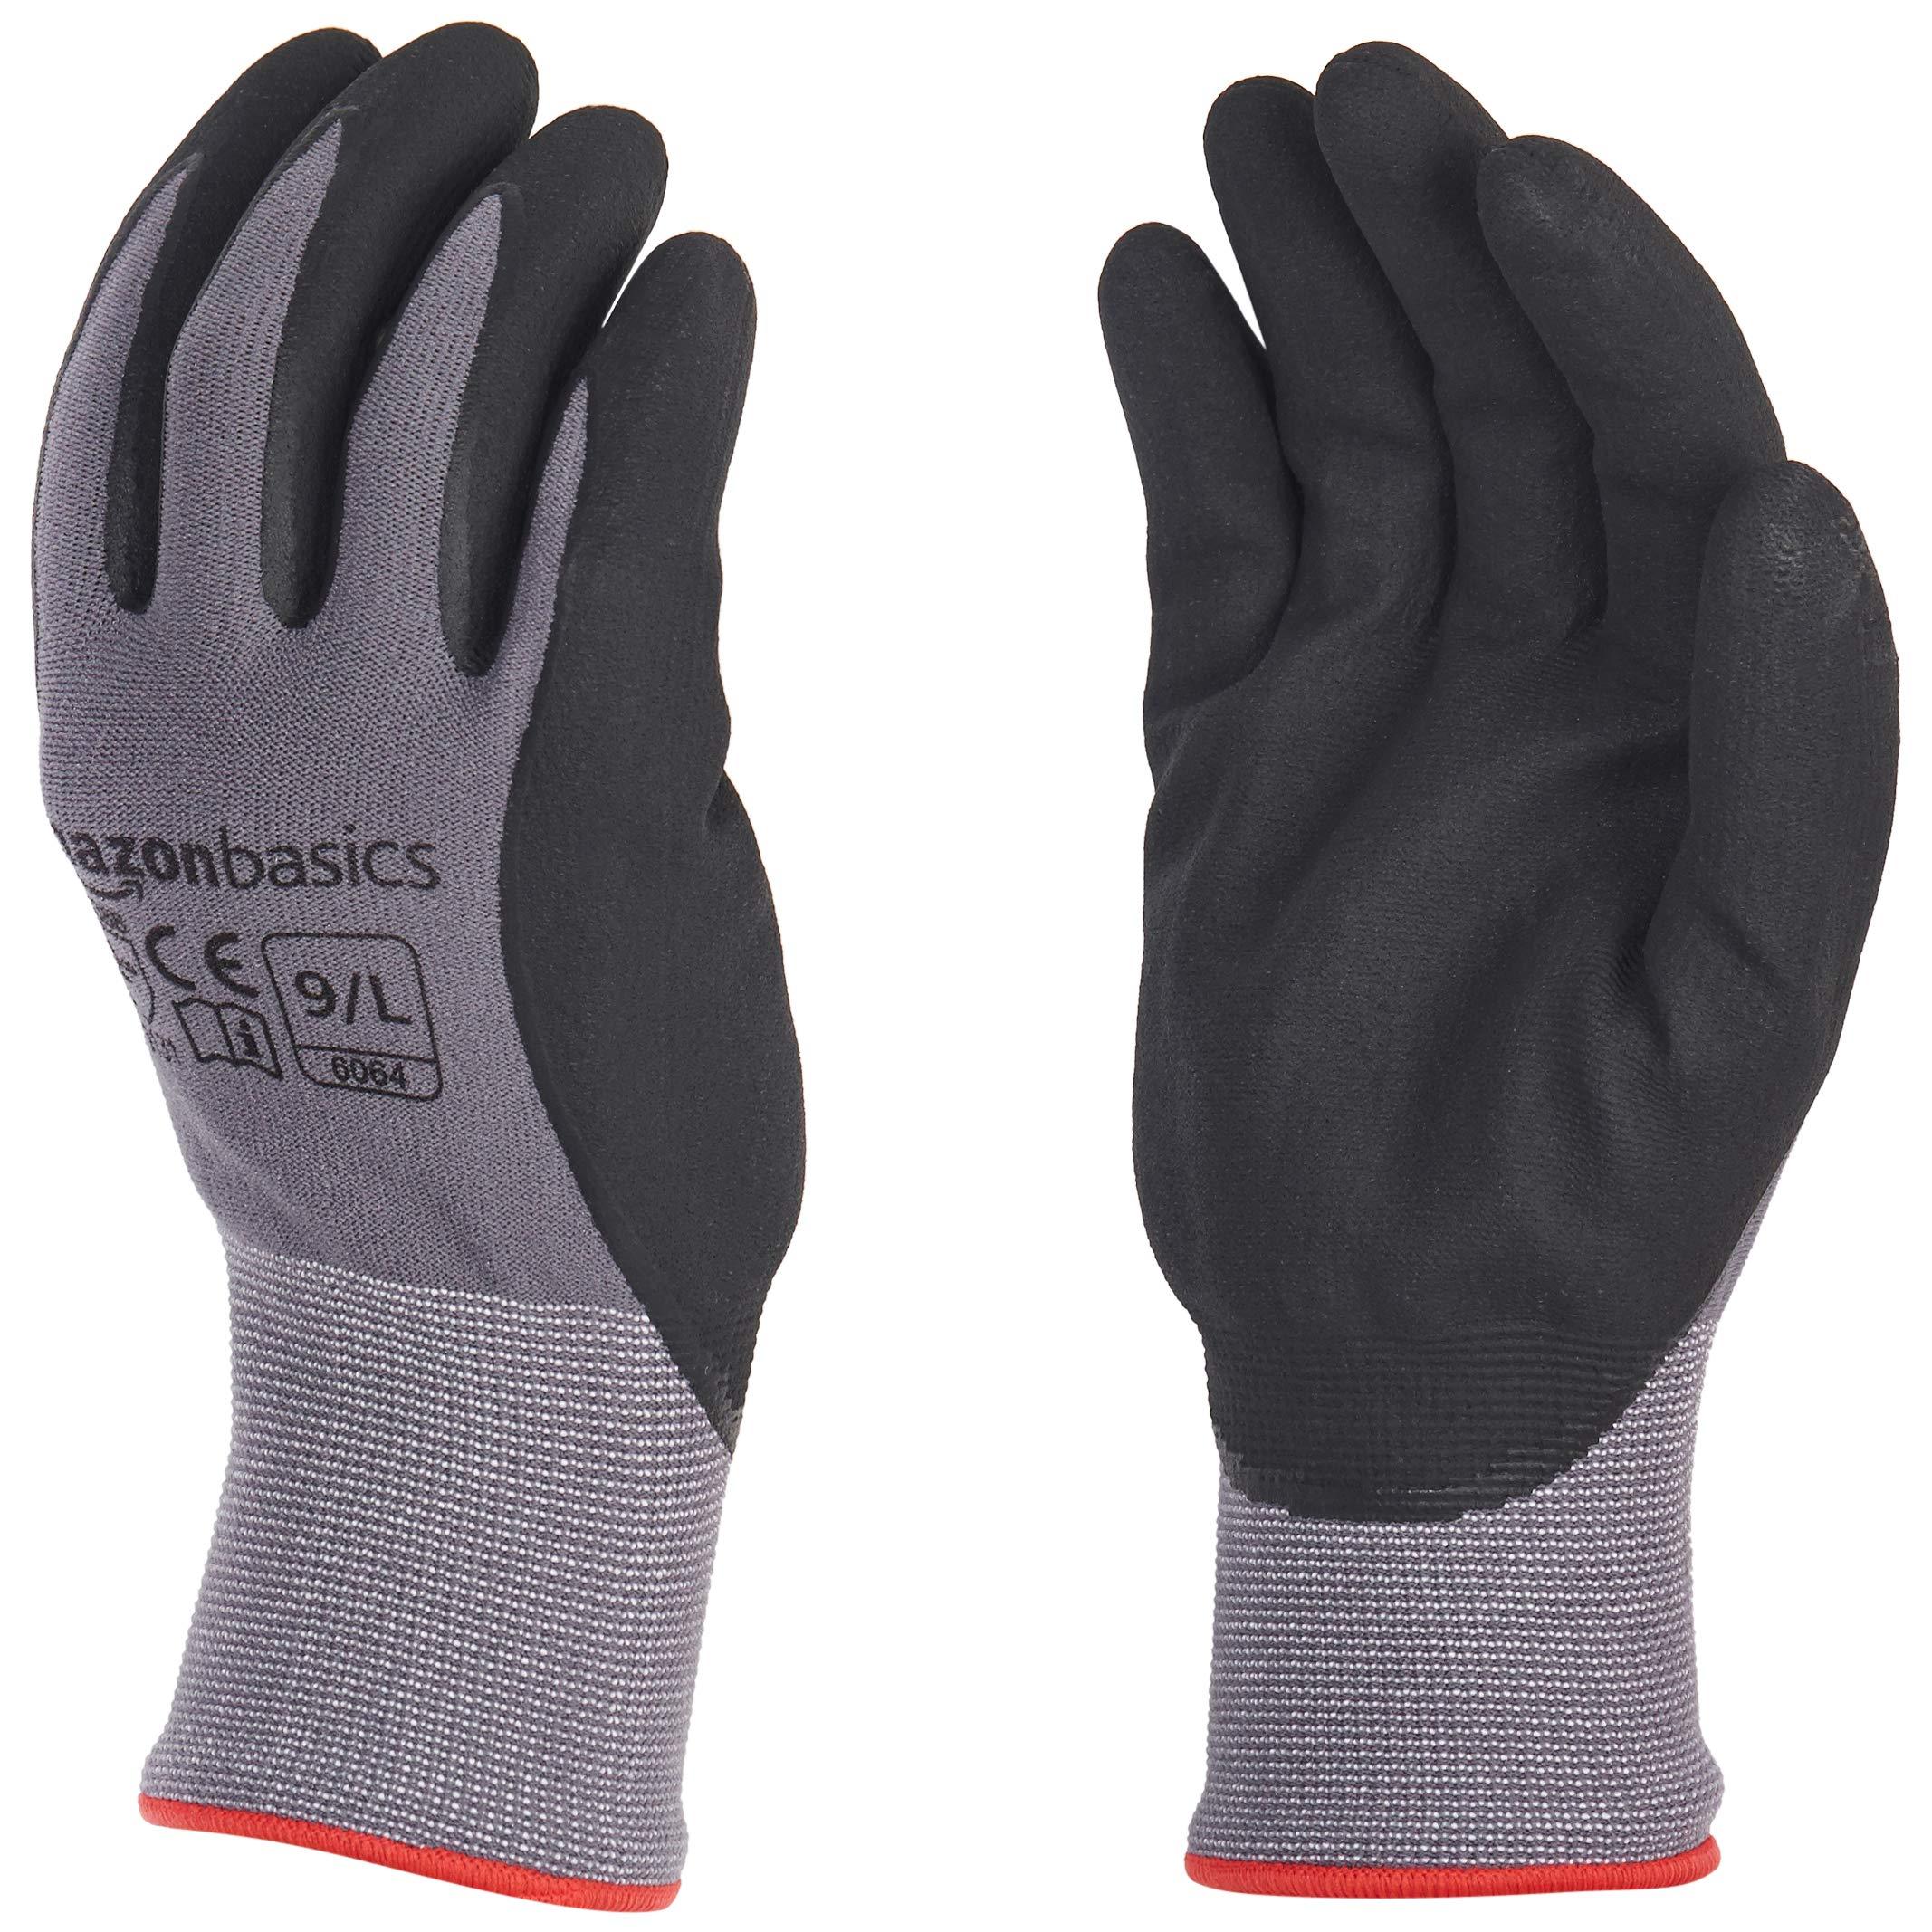 AmazonBasics Micro-Foam Nitrile Coated Work Gloves, Nylon Liner Fiber, Touch Screen, Grey, Size 9, L, 12-Pair by AmazonBasics